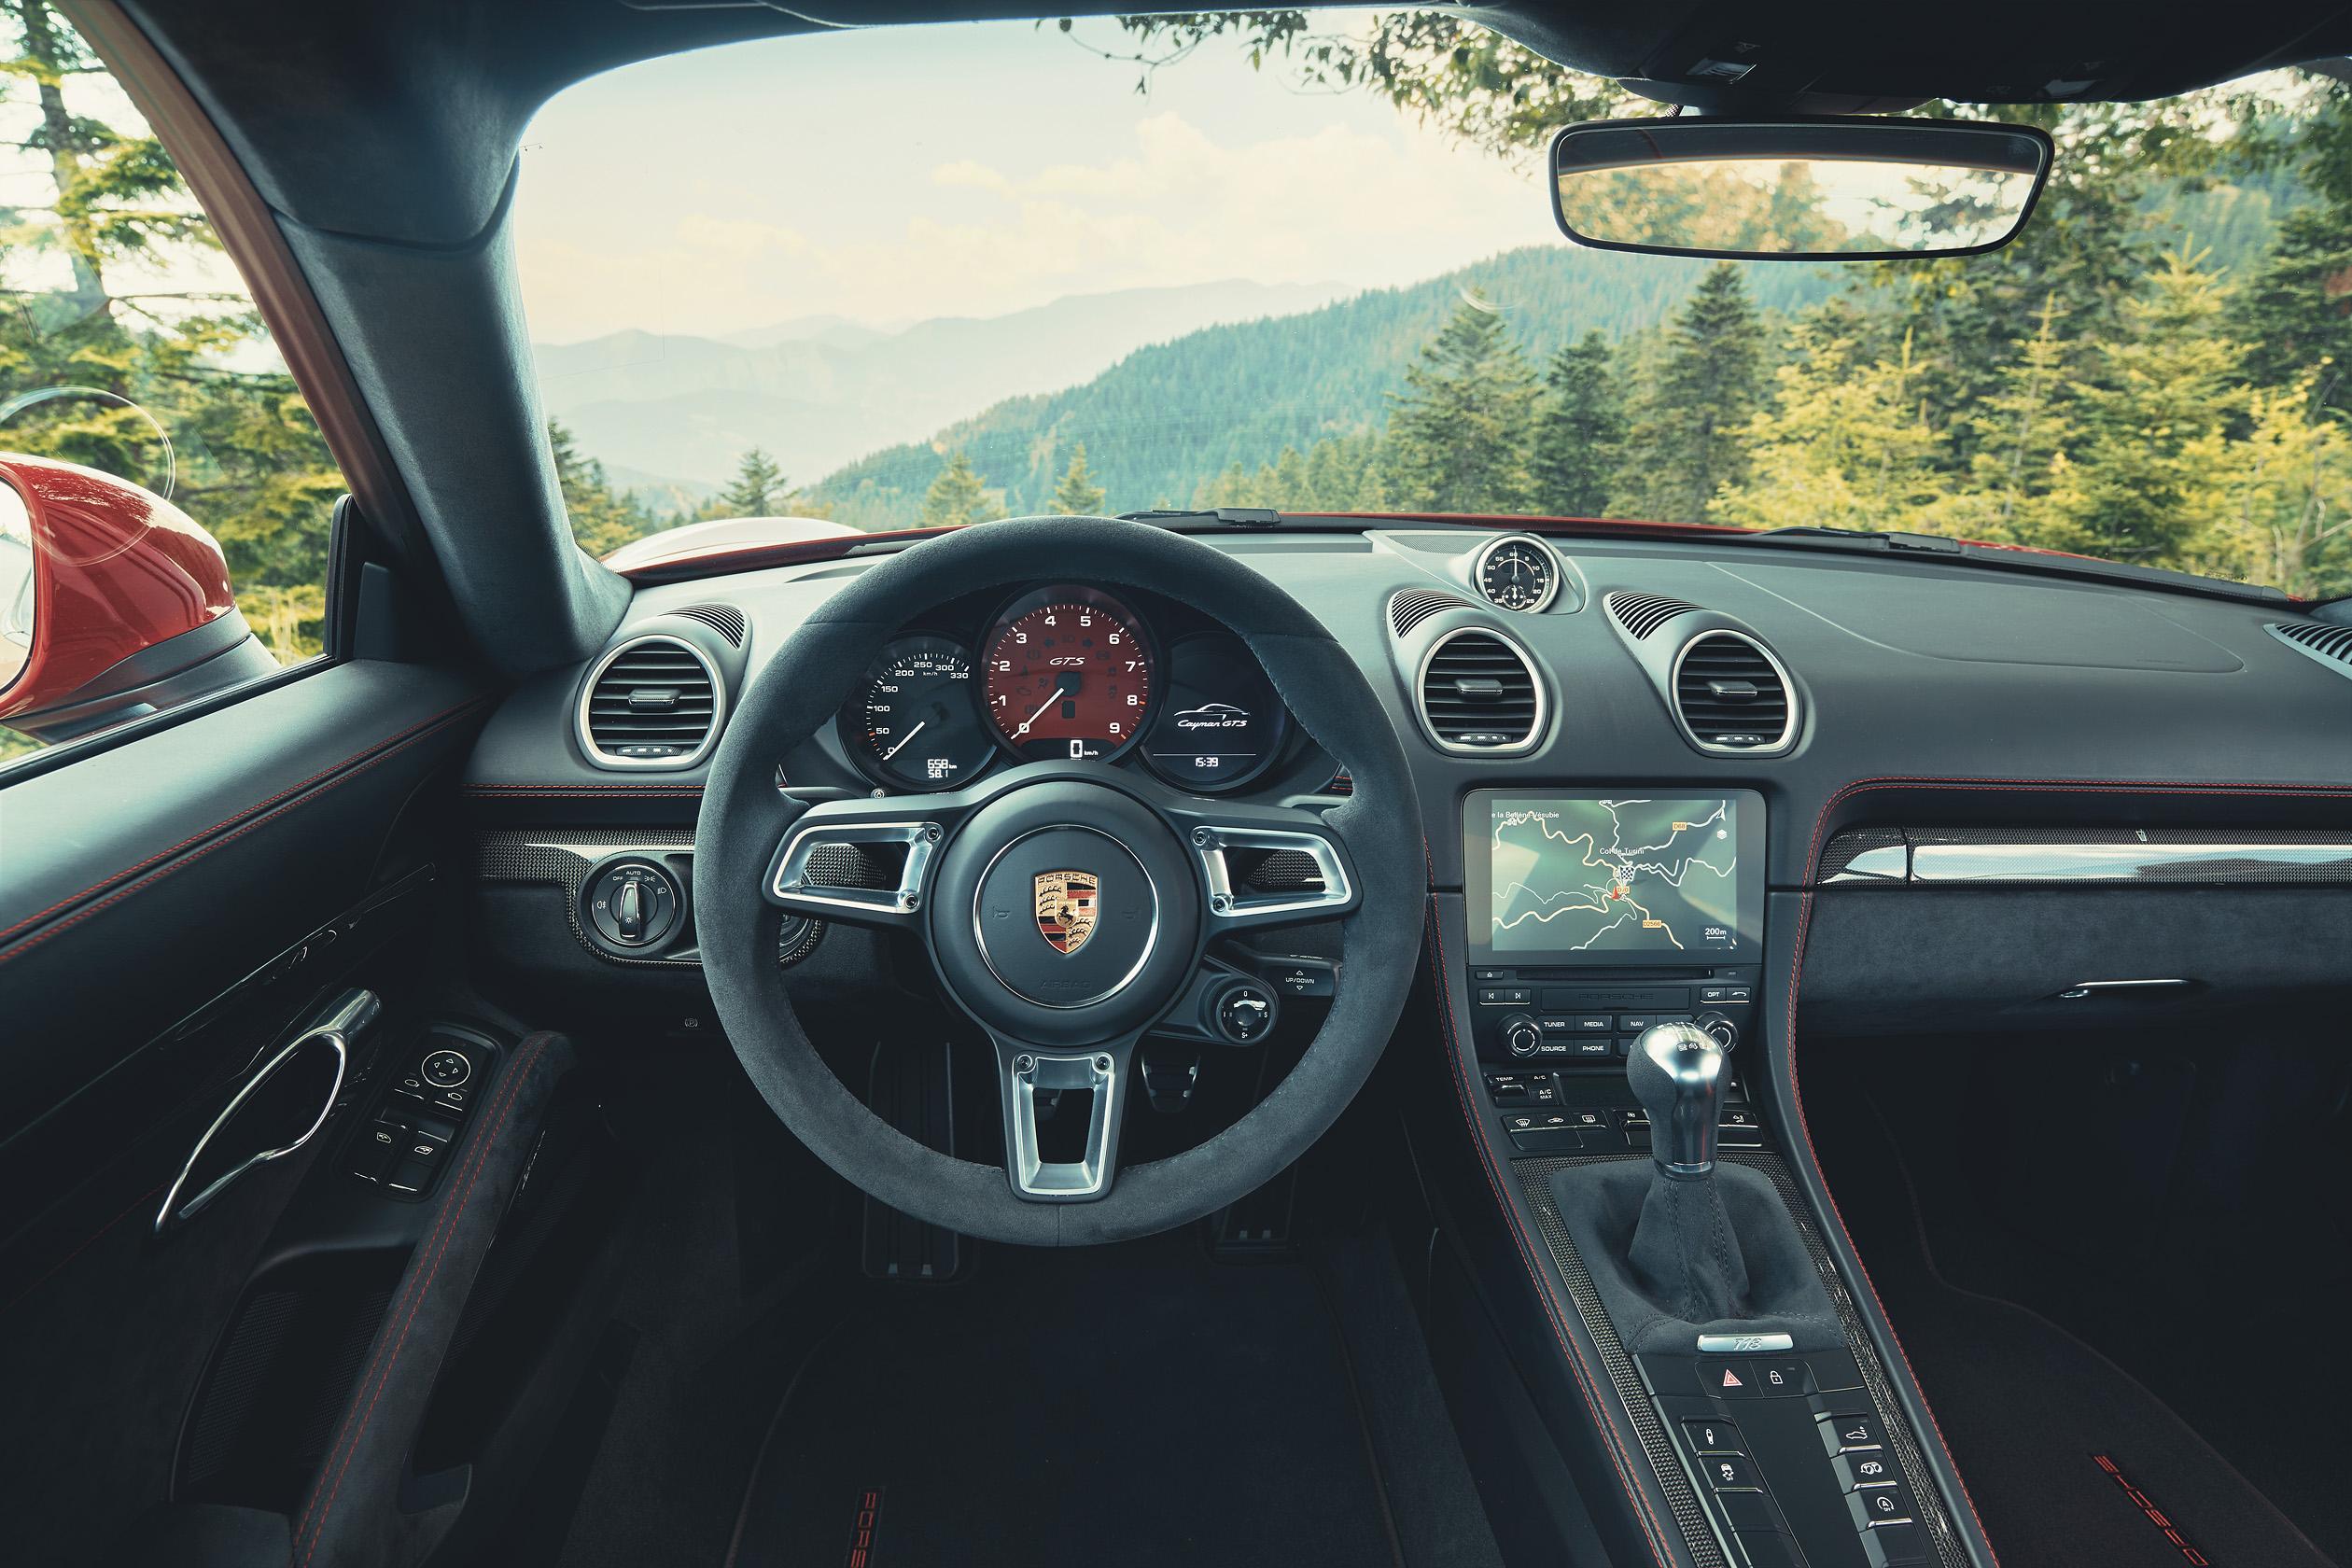 2020 Porsche 718 Cayman GTS 4.0 Interior